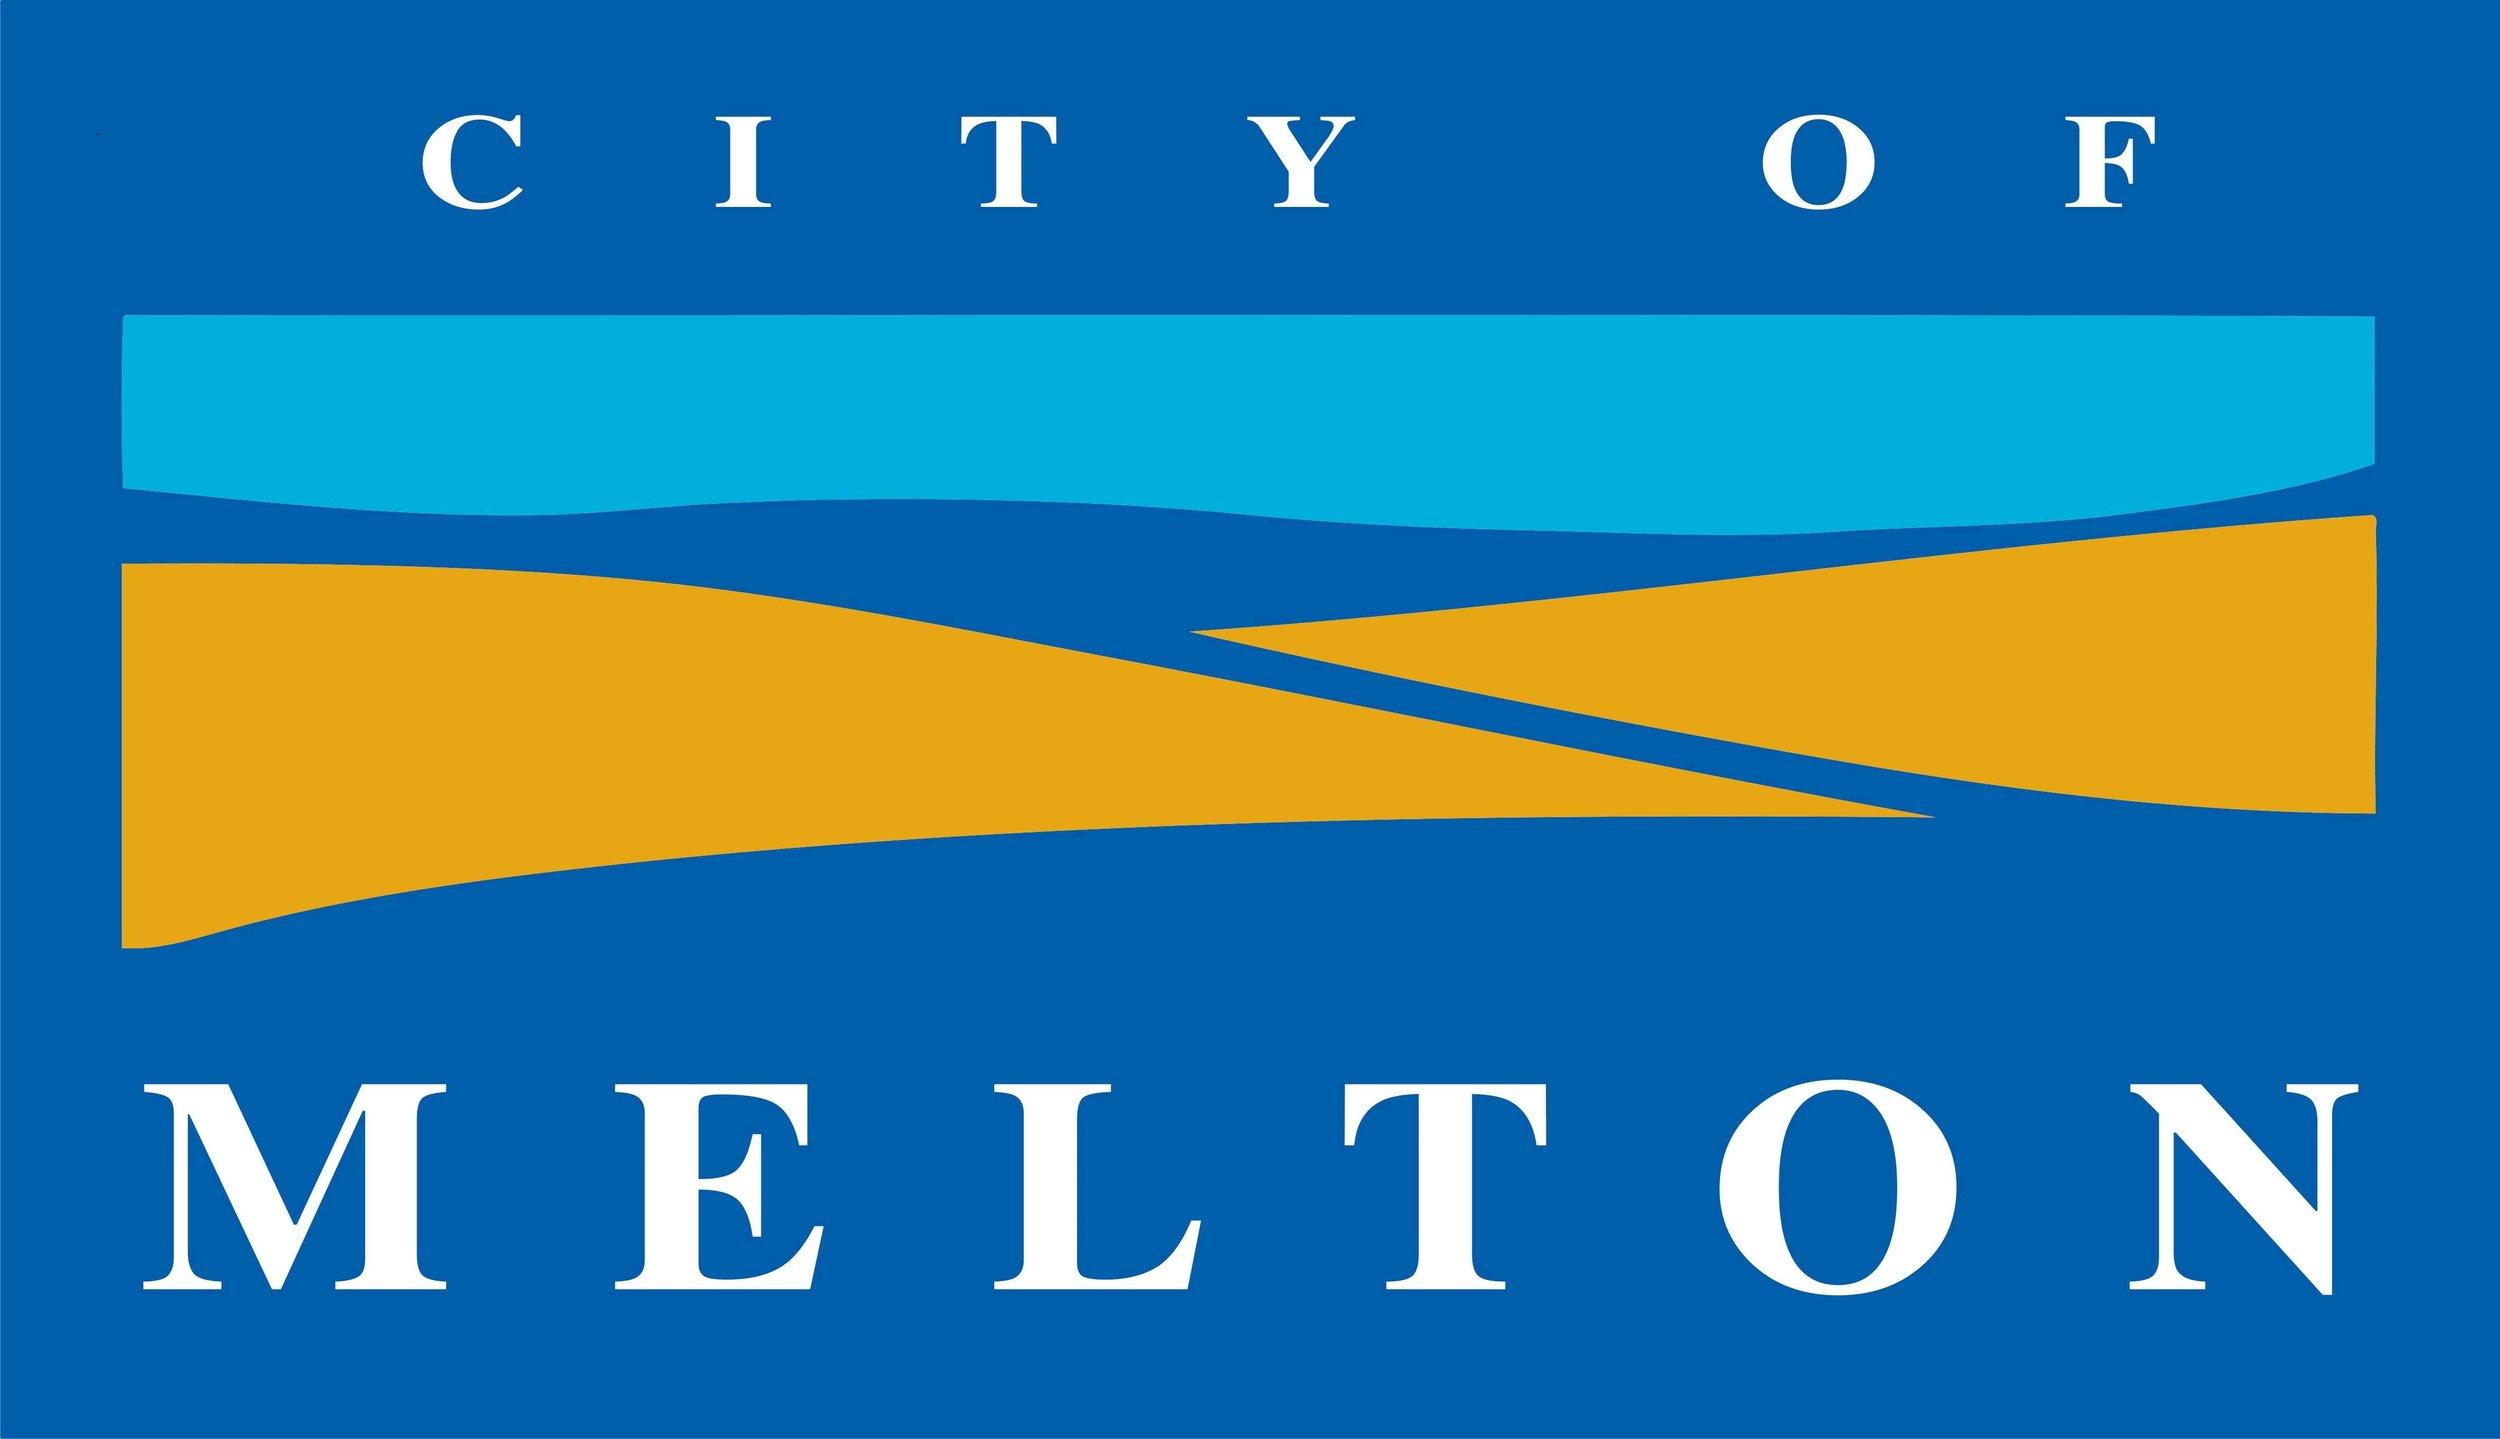 Melton logo.jpg